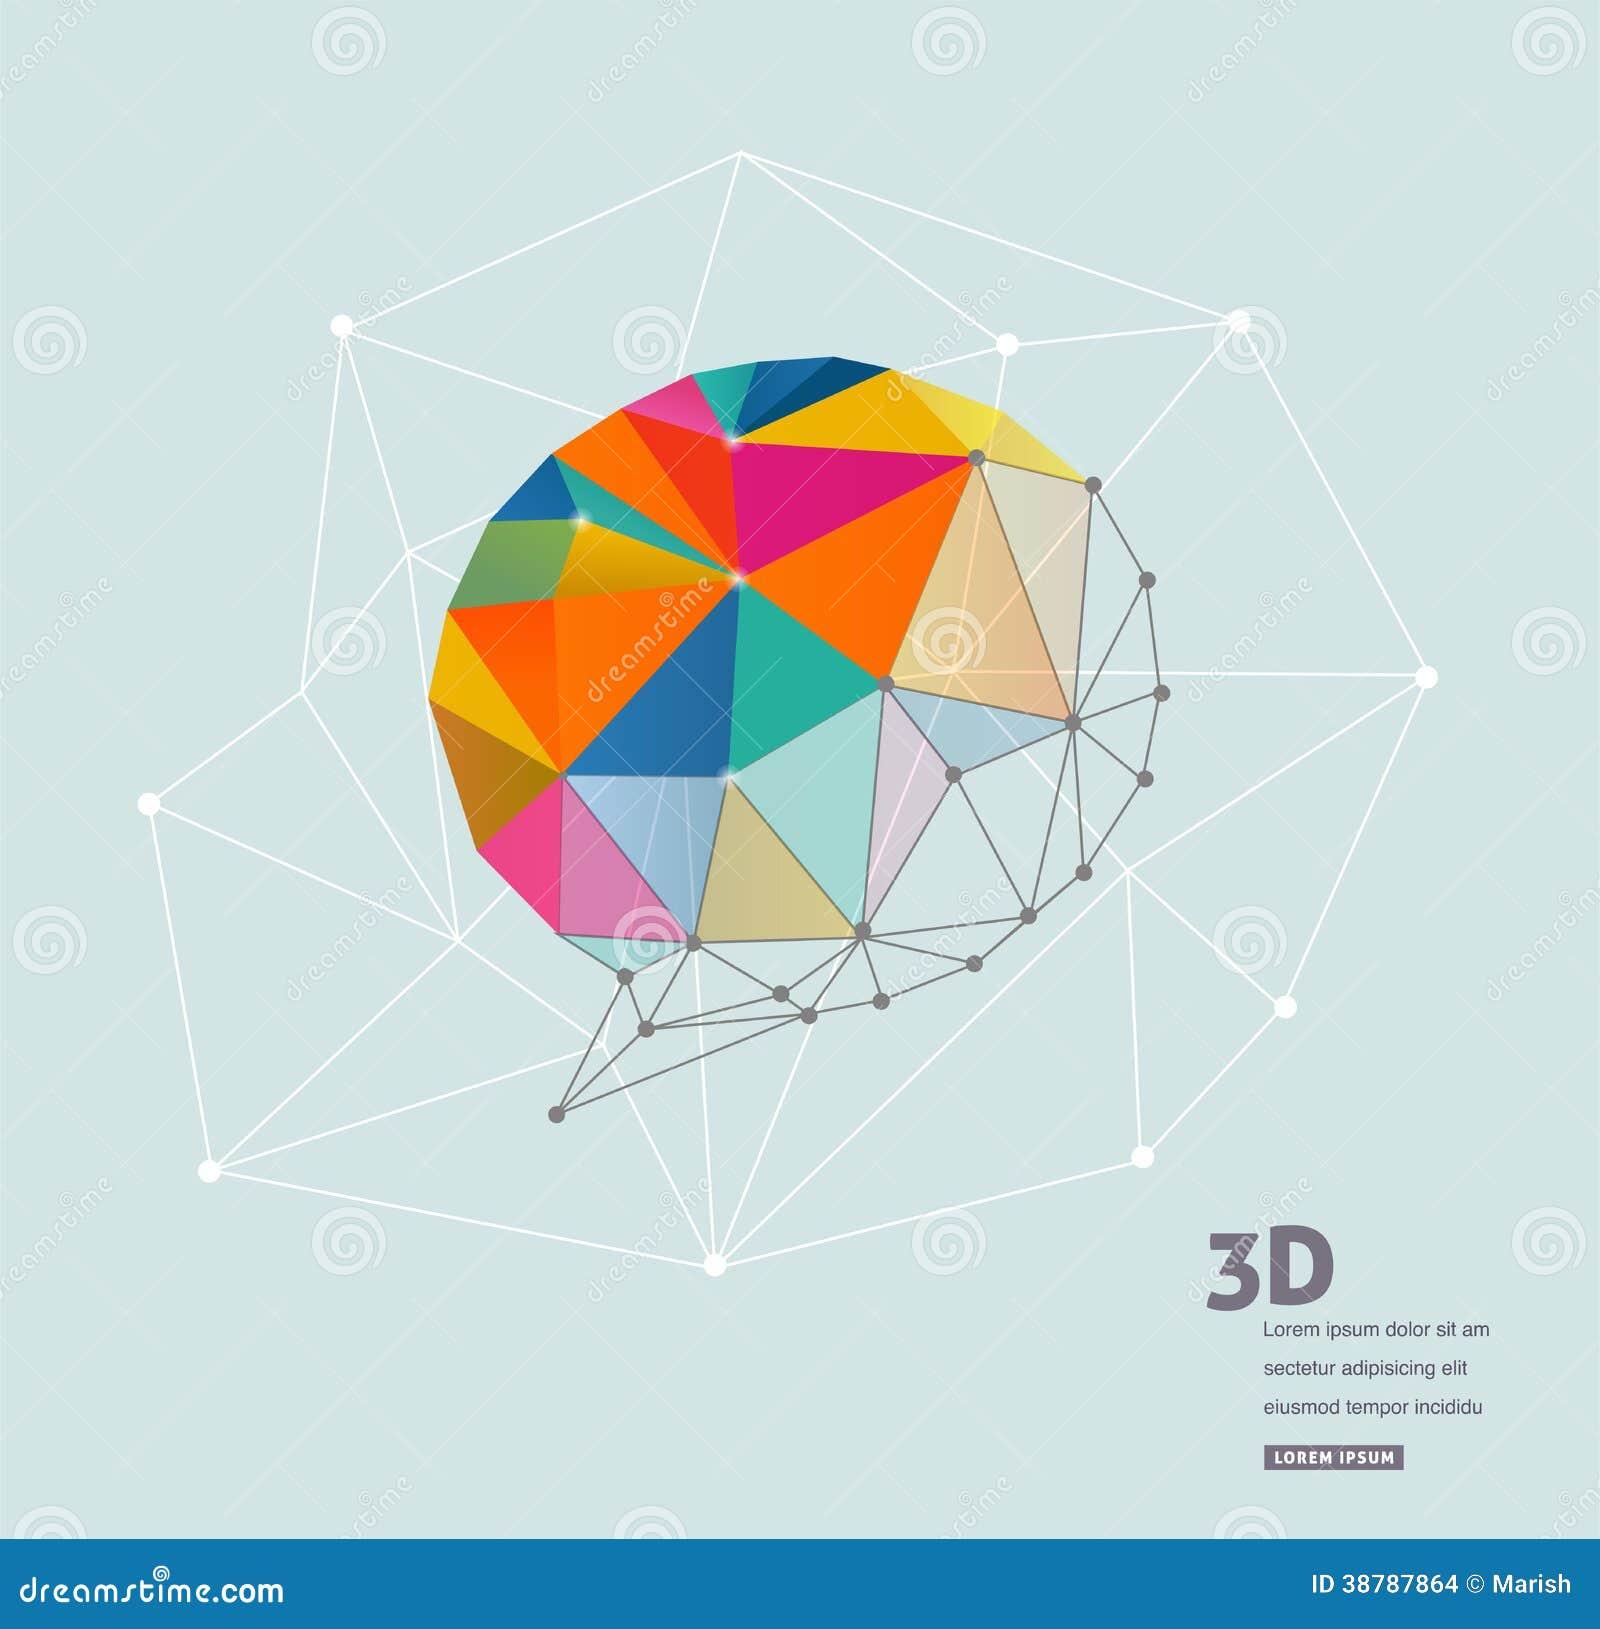 Geométrico poligonal, burbuja del discurso del vector 3D